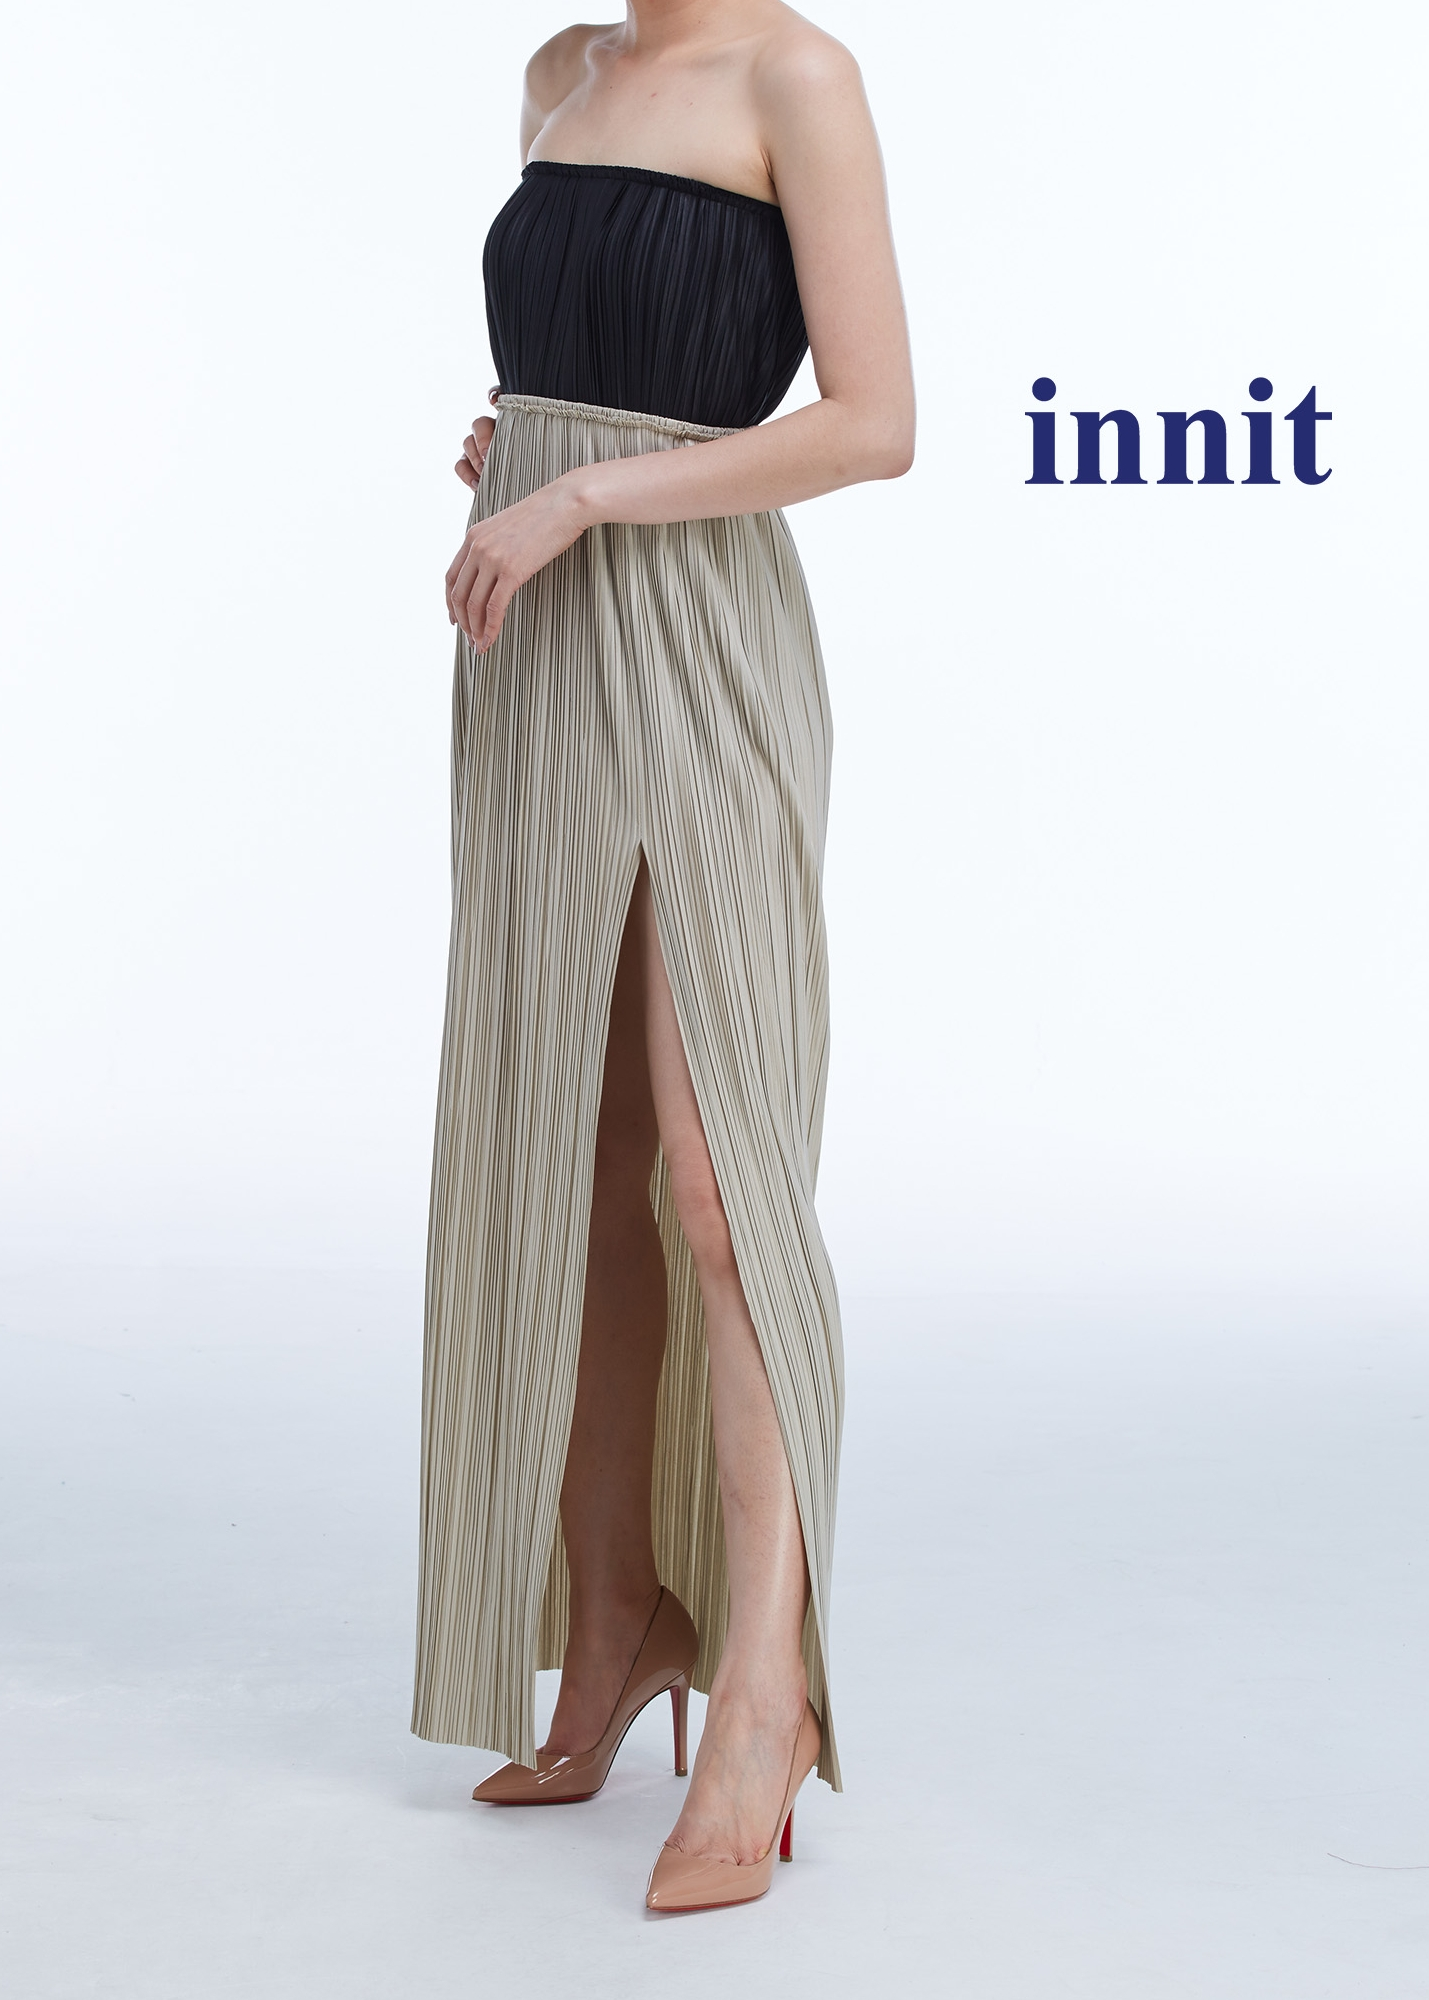 SLIT SKIRT   Pleated Skirt worn as a top